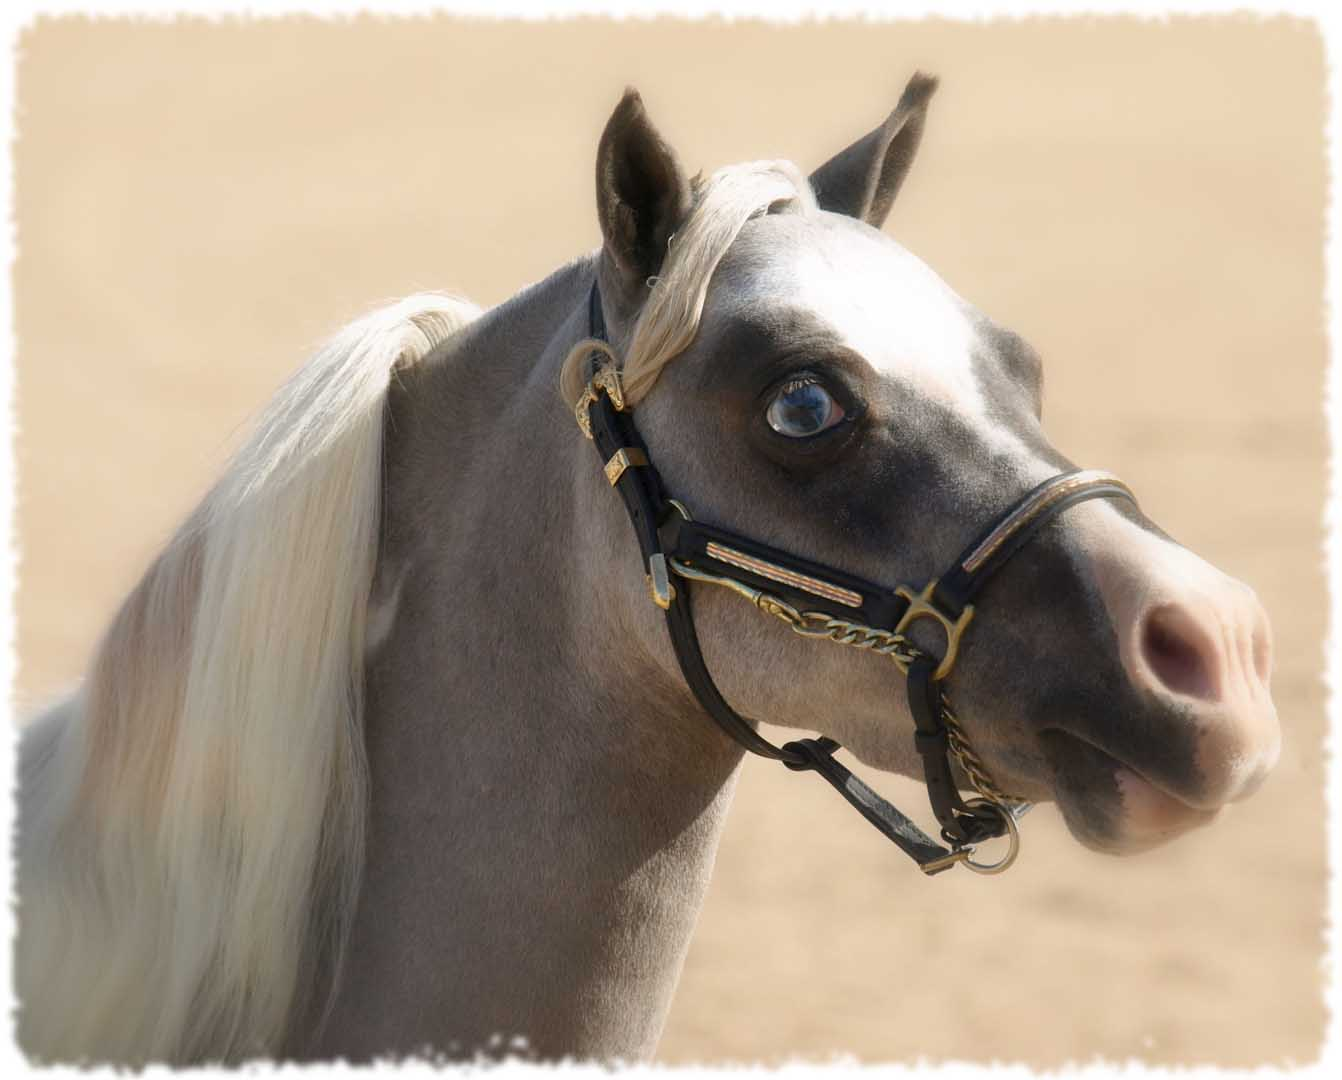 miniature horse arizona, miniature driving gelding for ... | 1342 x 1080 jpeg 86kB